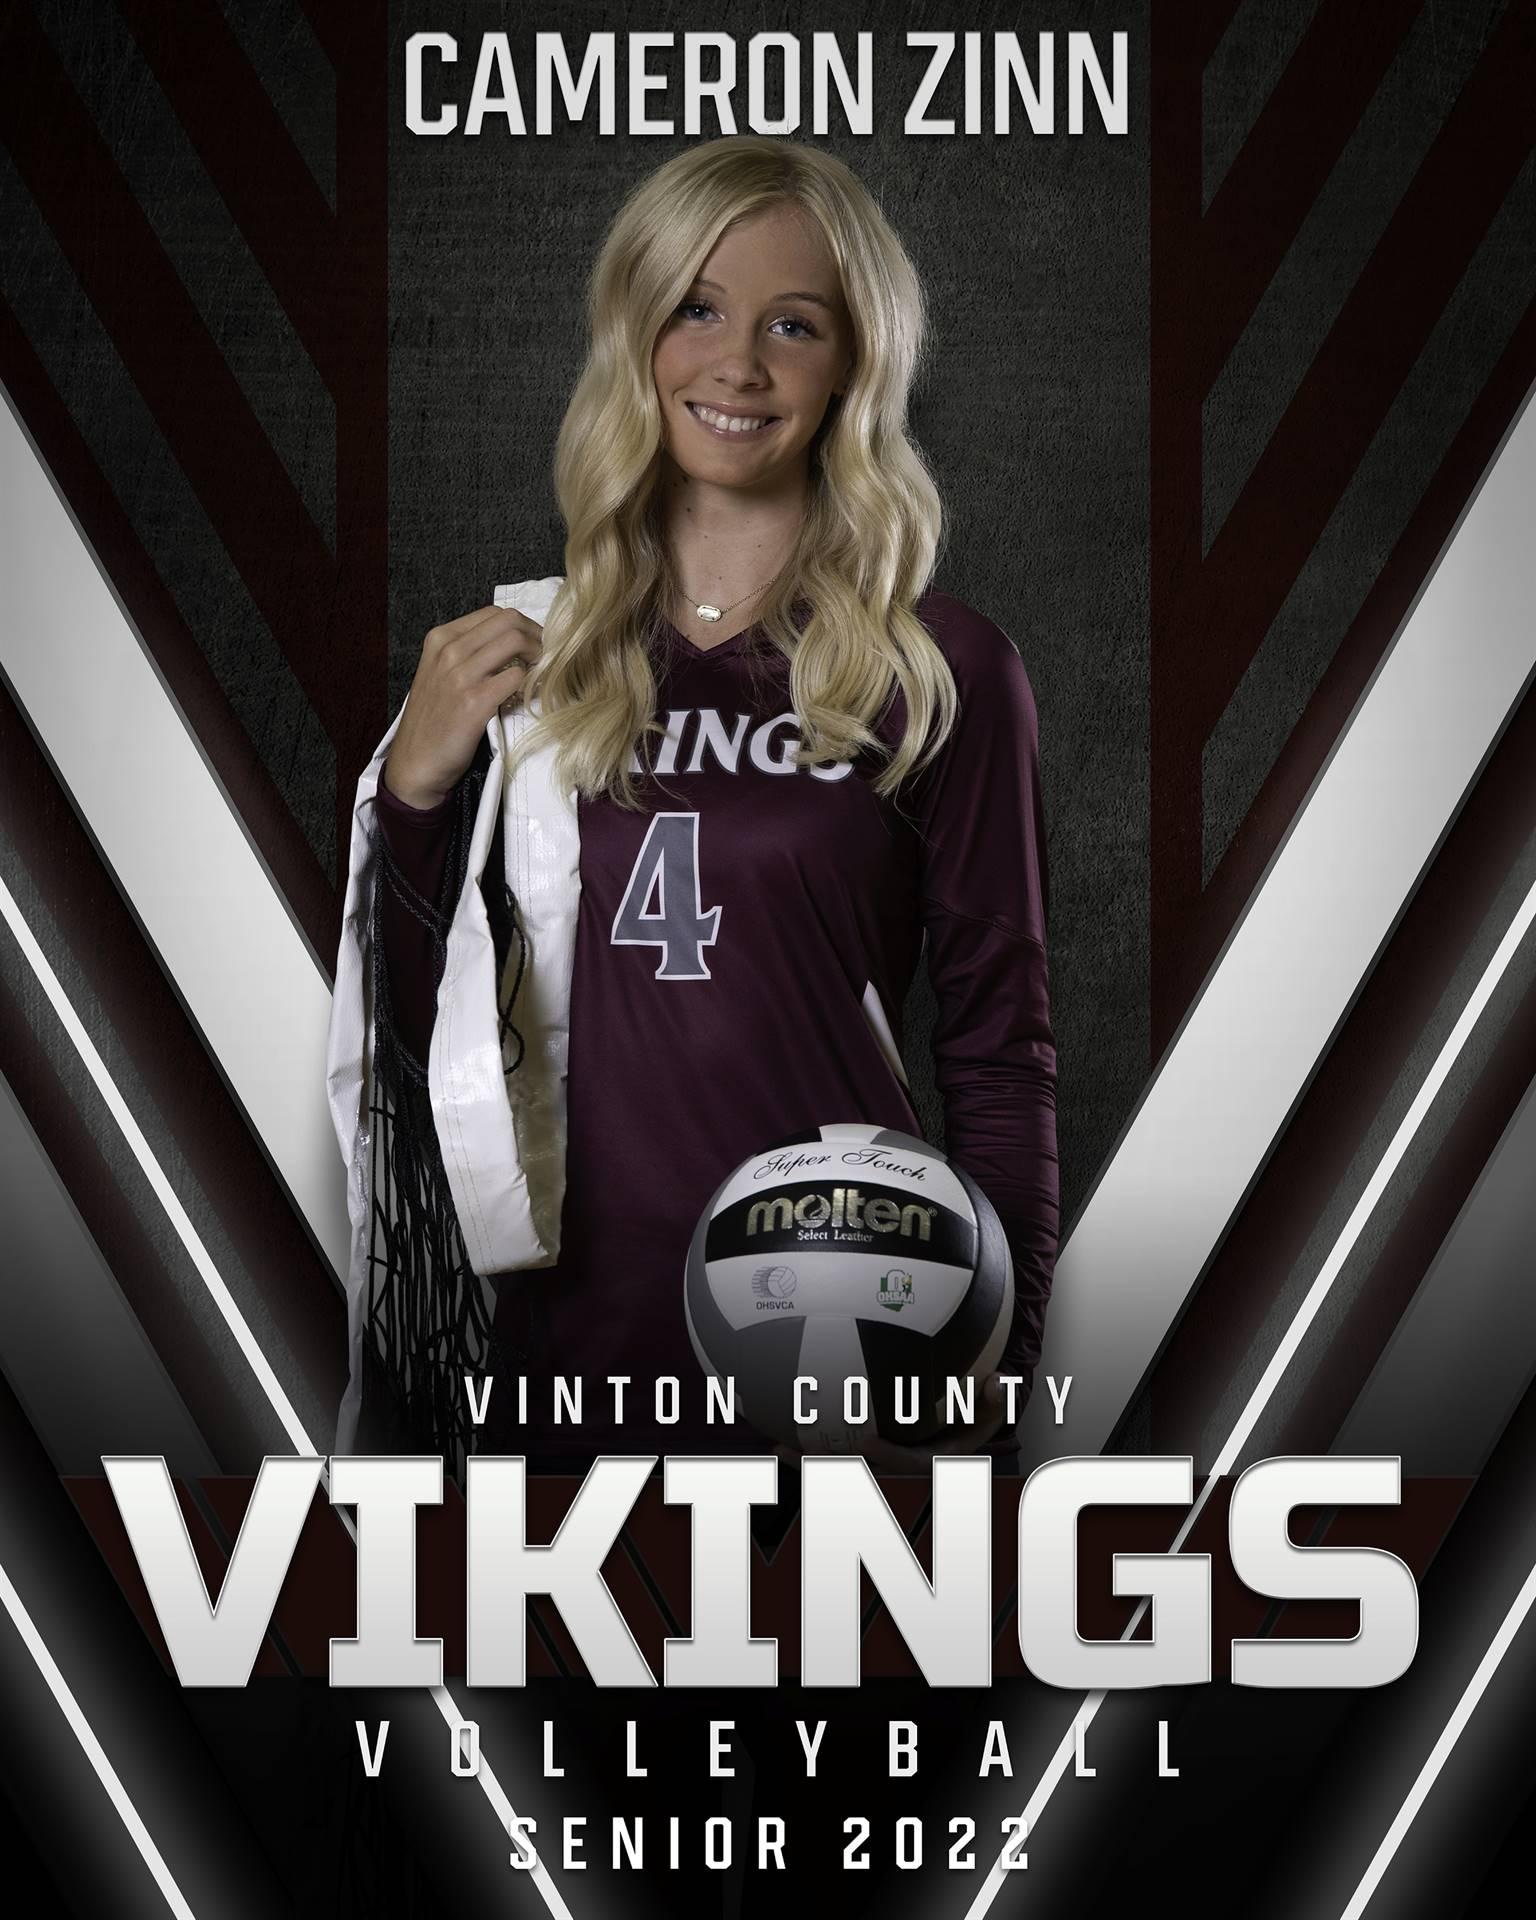 Cameron Zinn - Volleyball